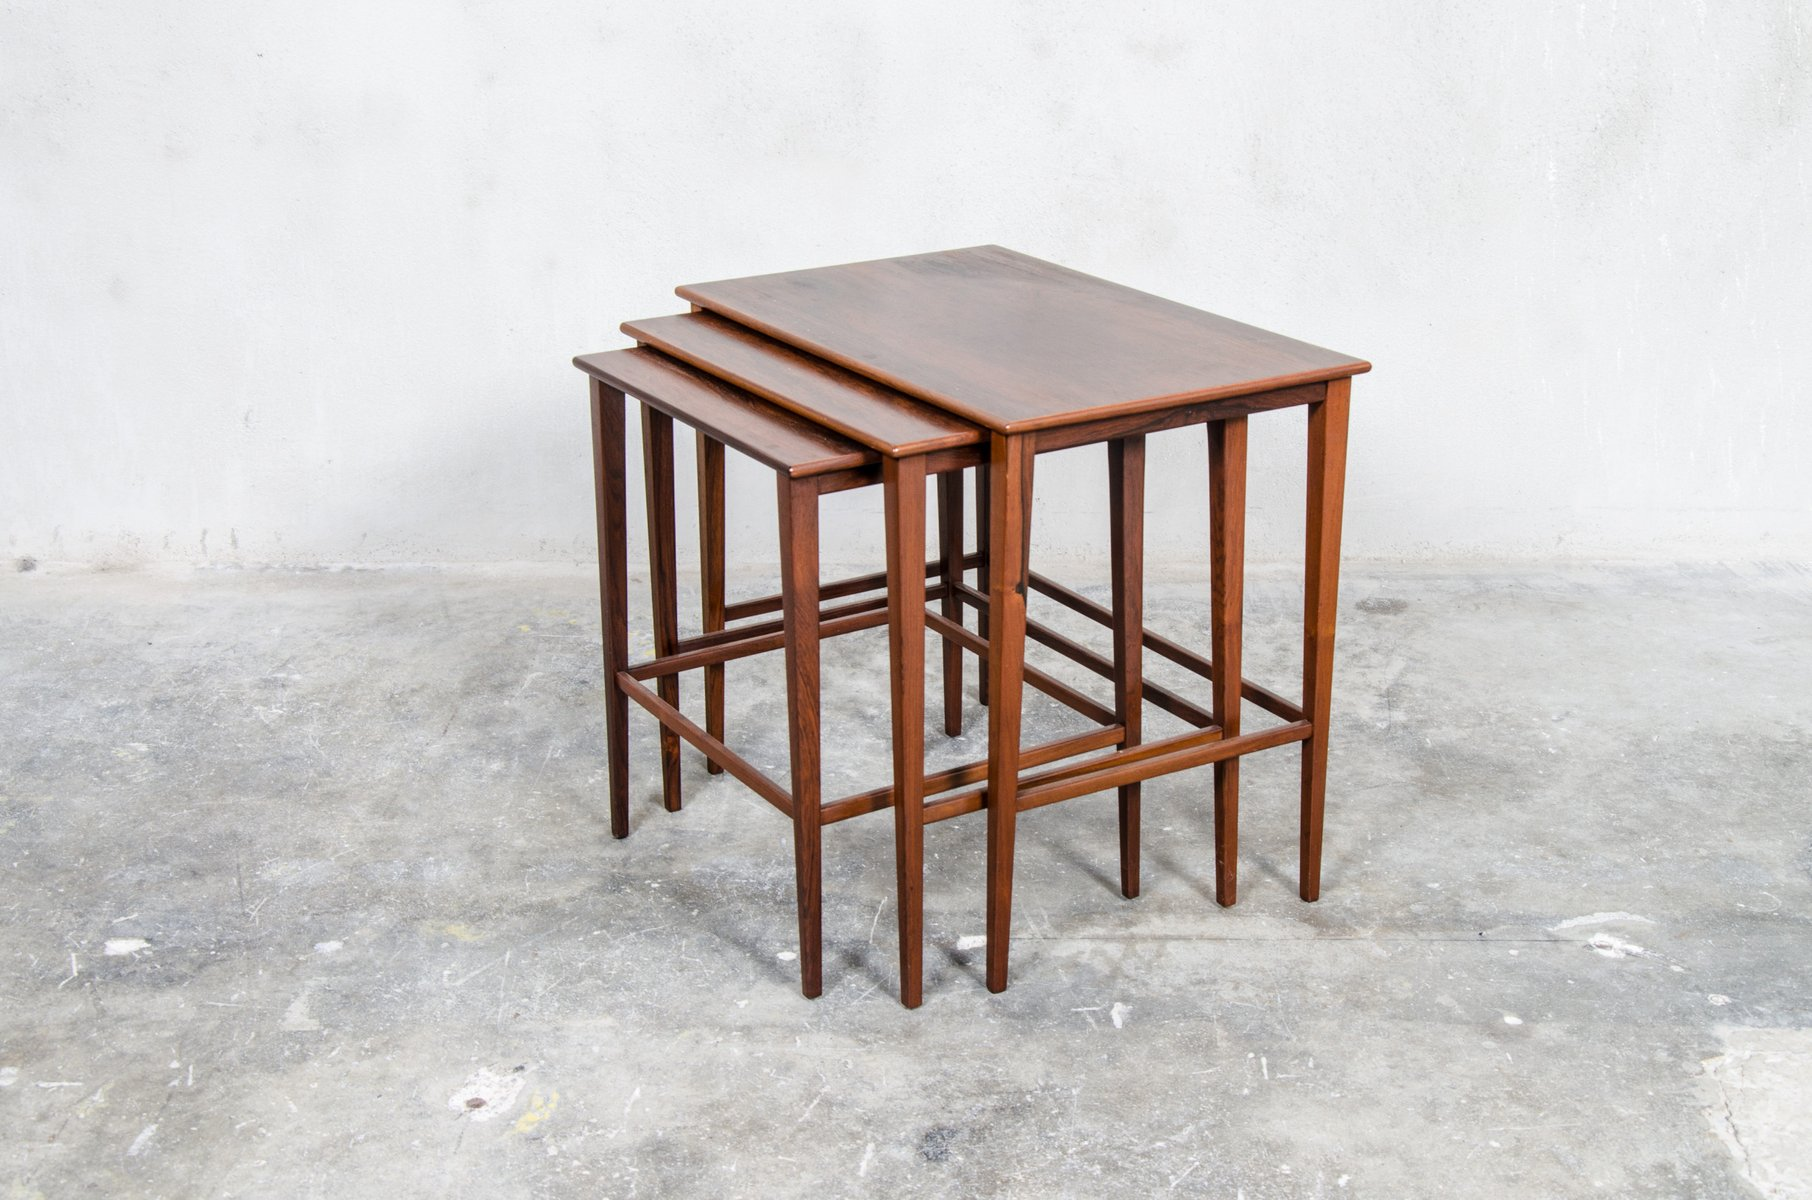 Danish Matching Teak Nesting Tables 1960s